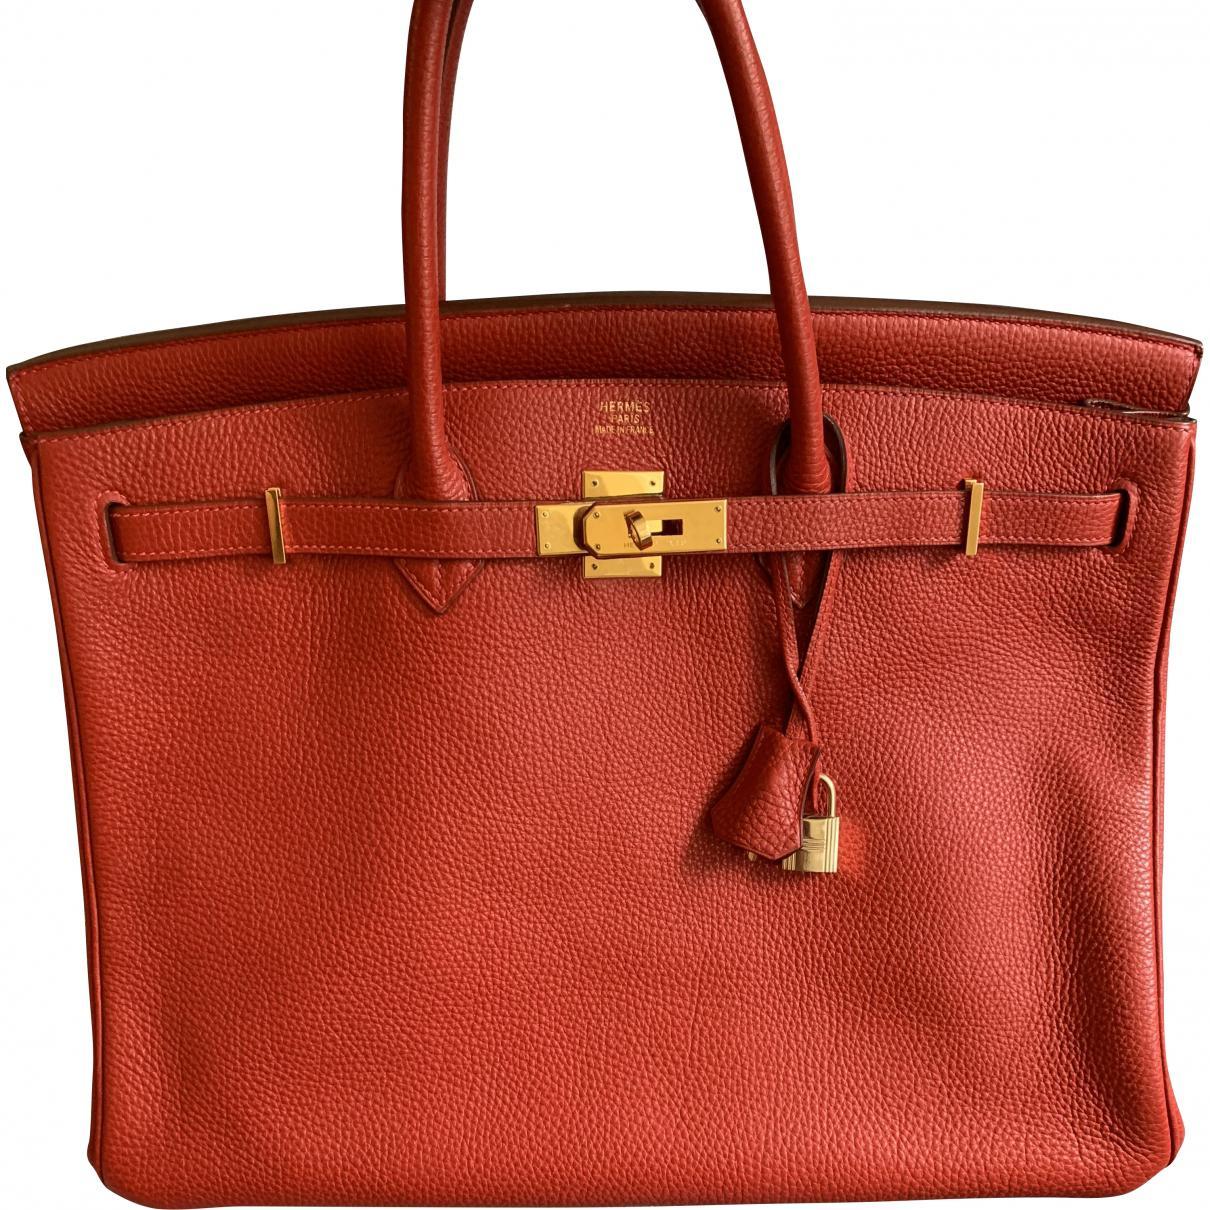 1d1c5cbe46 Hermès. Women s Red Pre-owned Birkin 40 Leather Handbag. £6